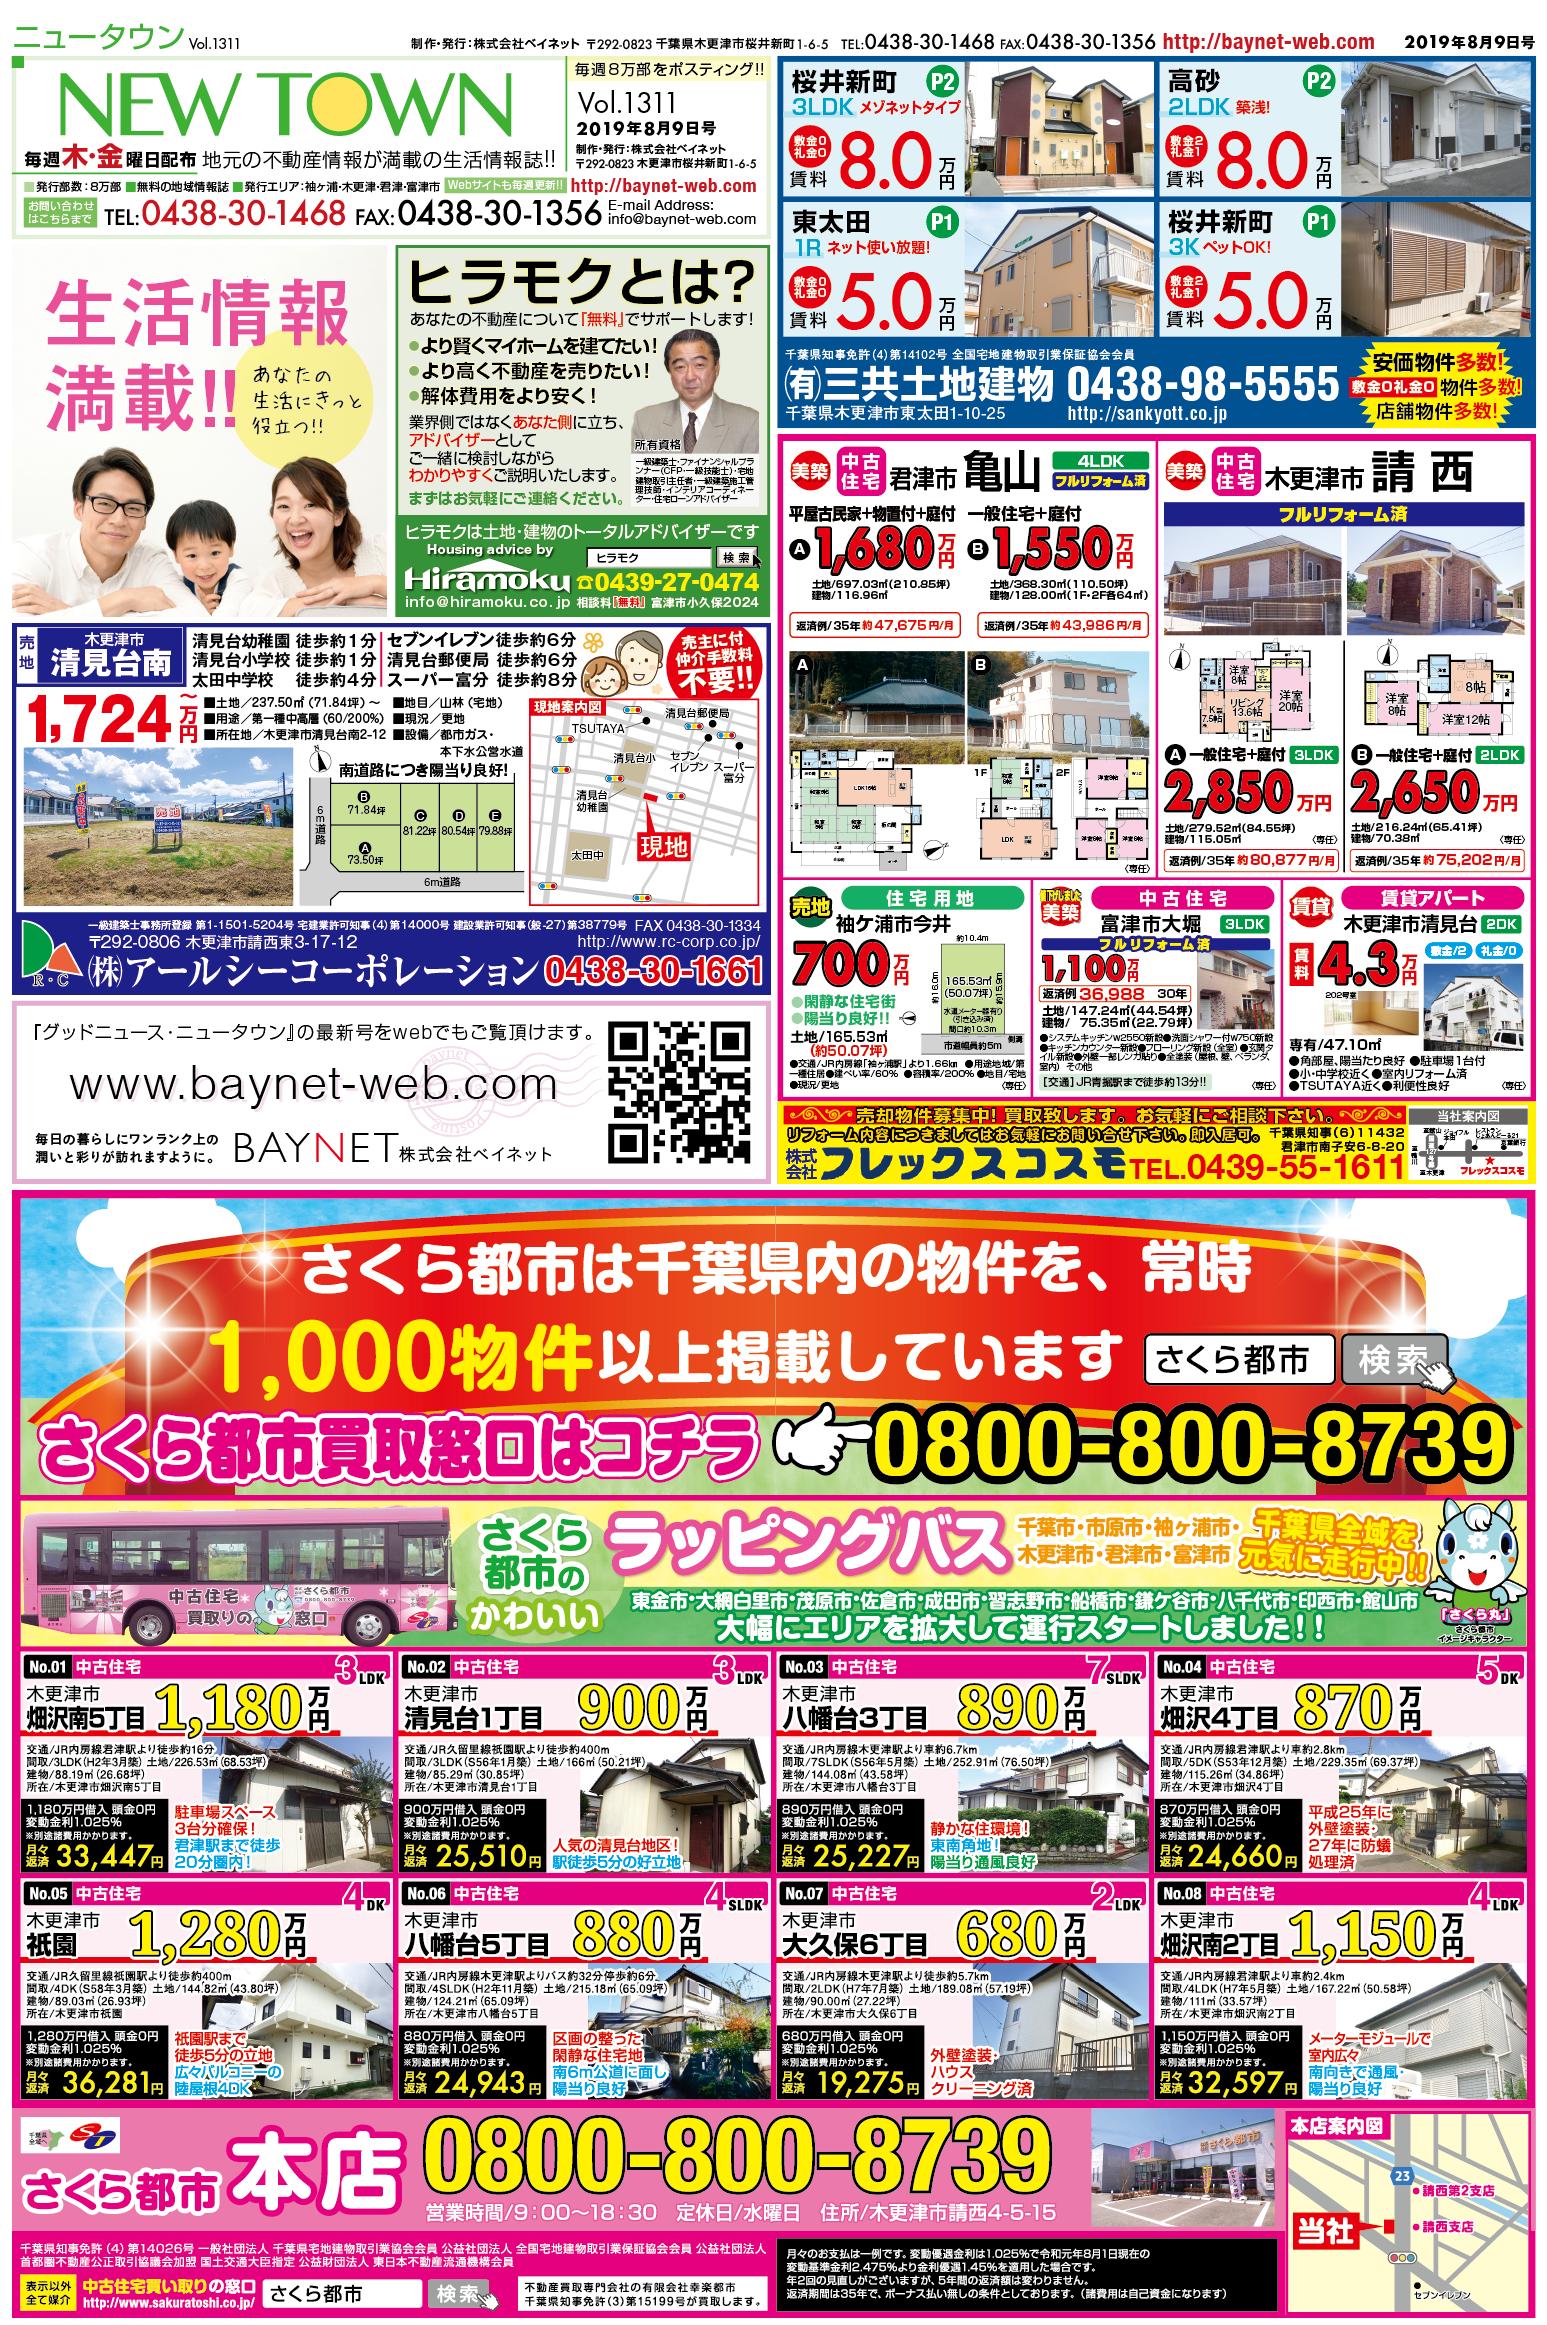 Hiramoku アールシーコーポレーション 三共土地建物 フレックスコスモ さくら都市本店